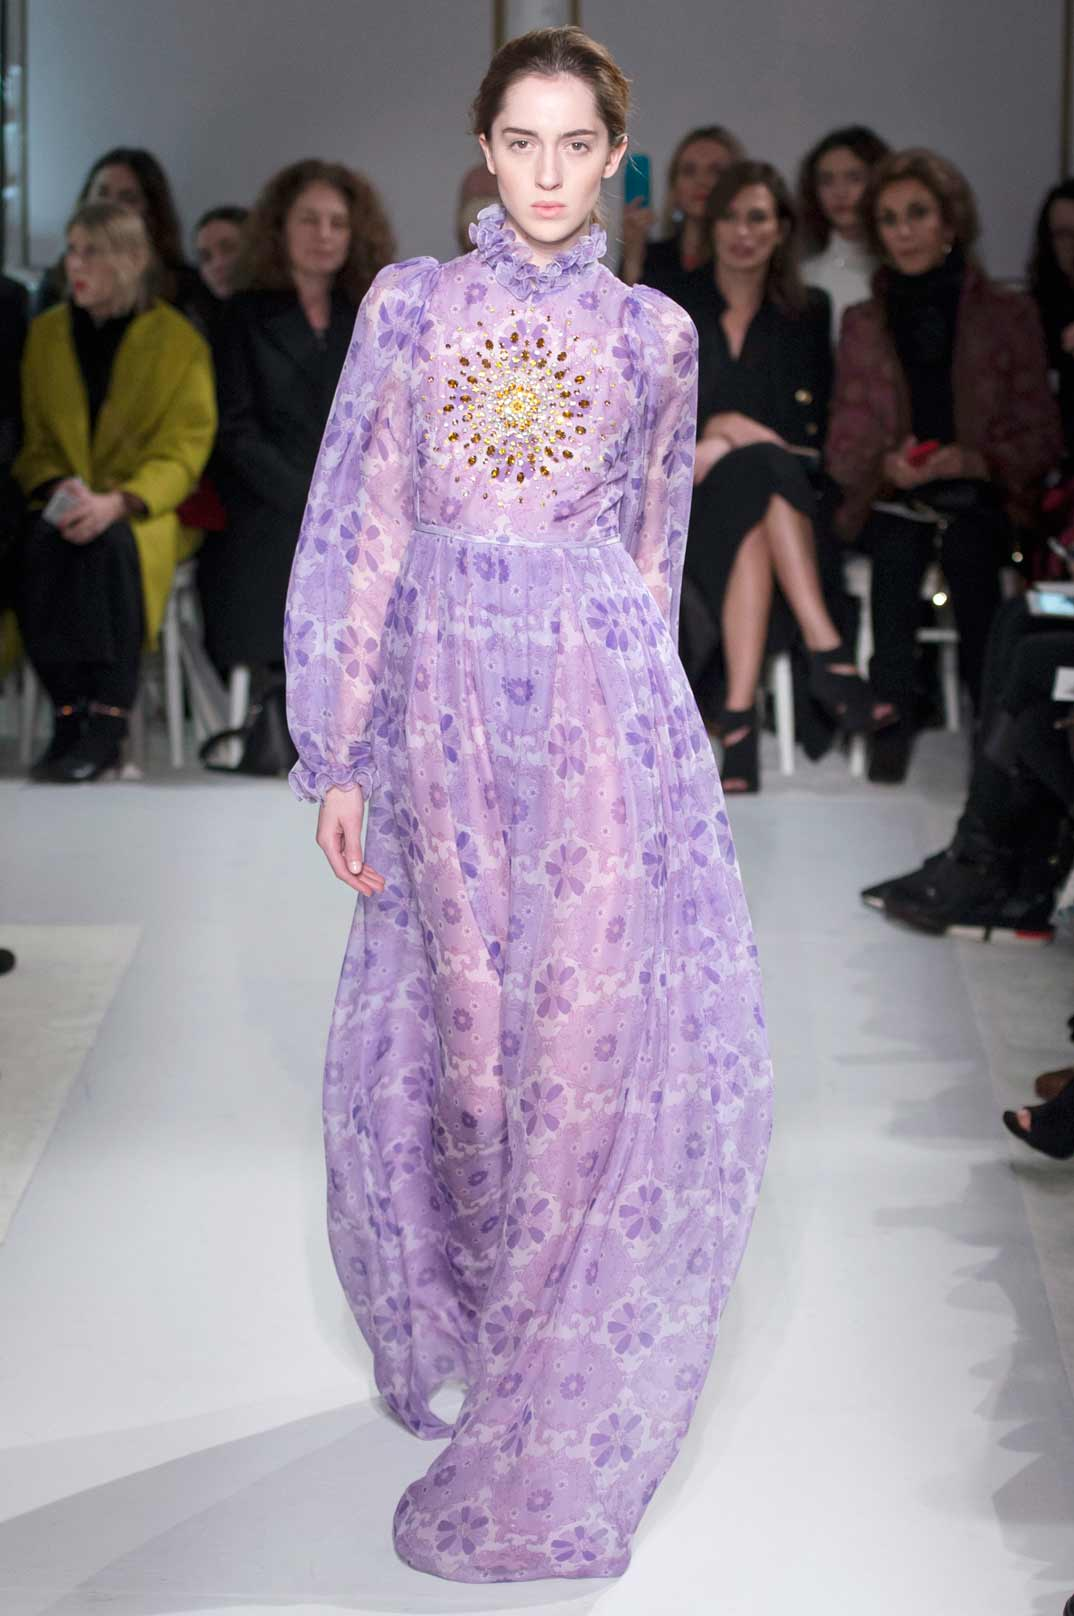 Atractivo Vestido De Boda Arte Composición - Ideas de Vestidos de ...